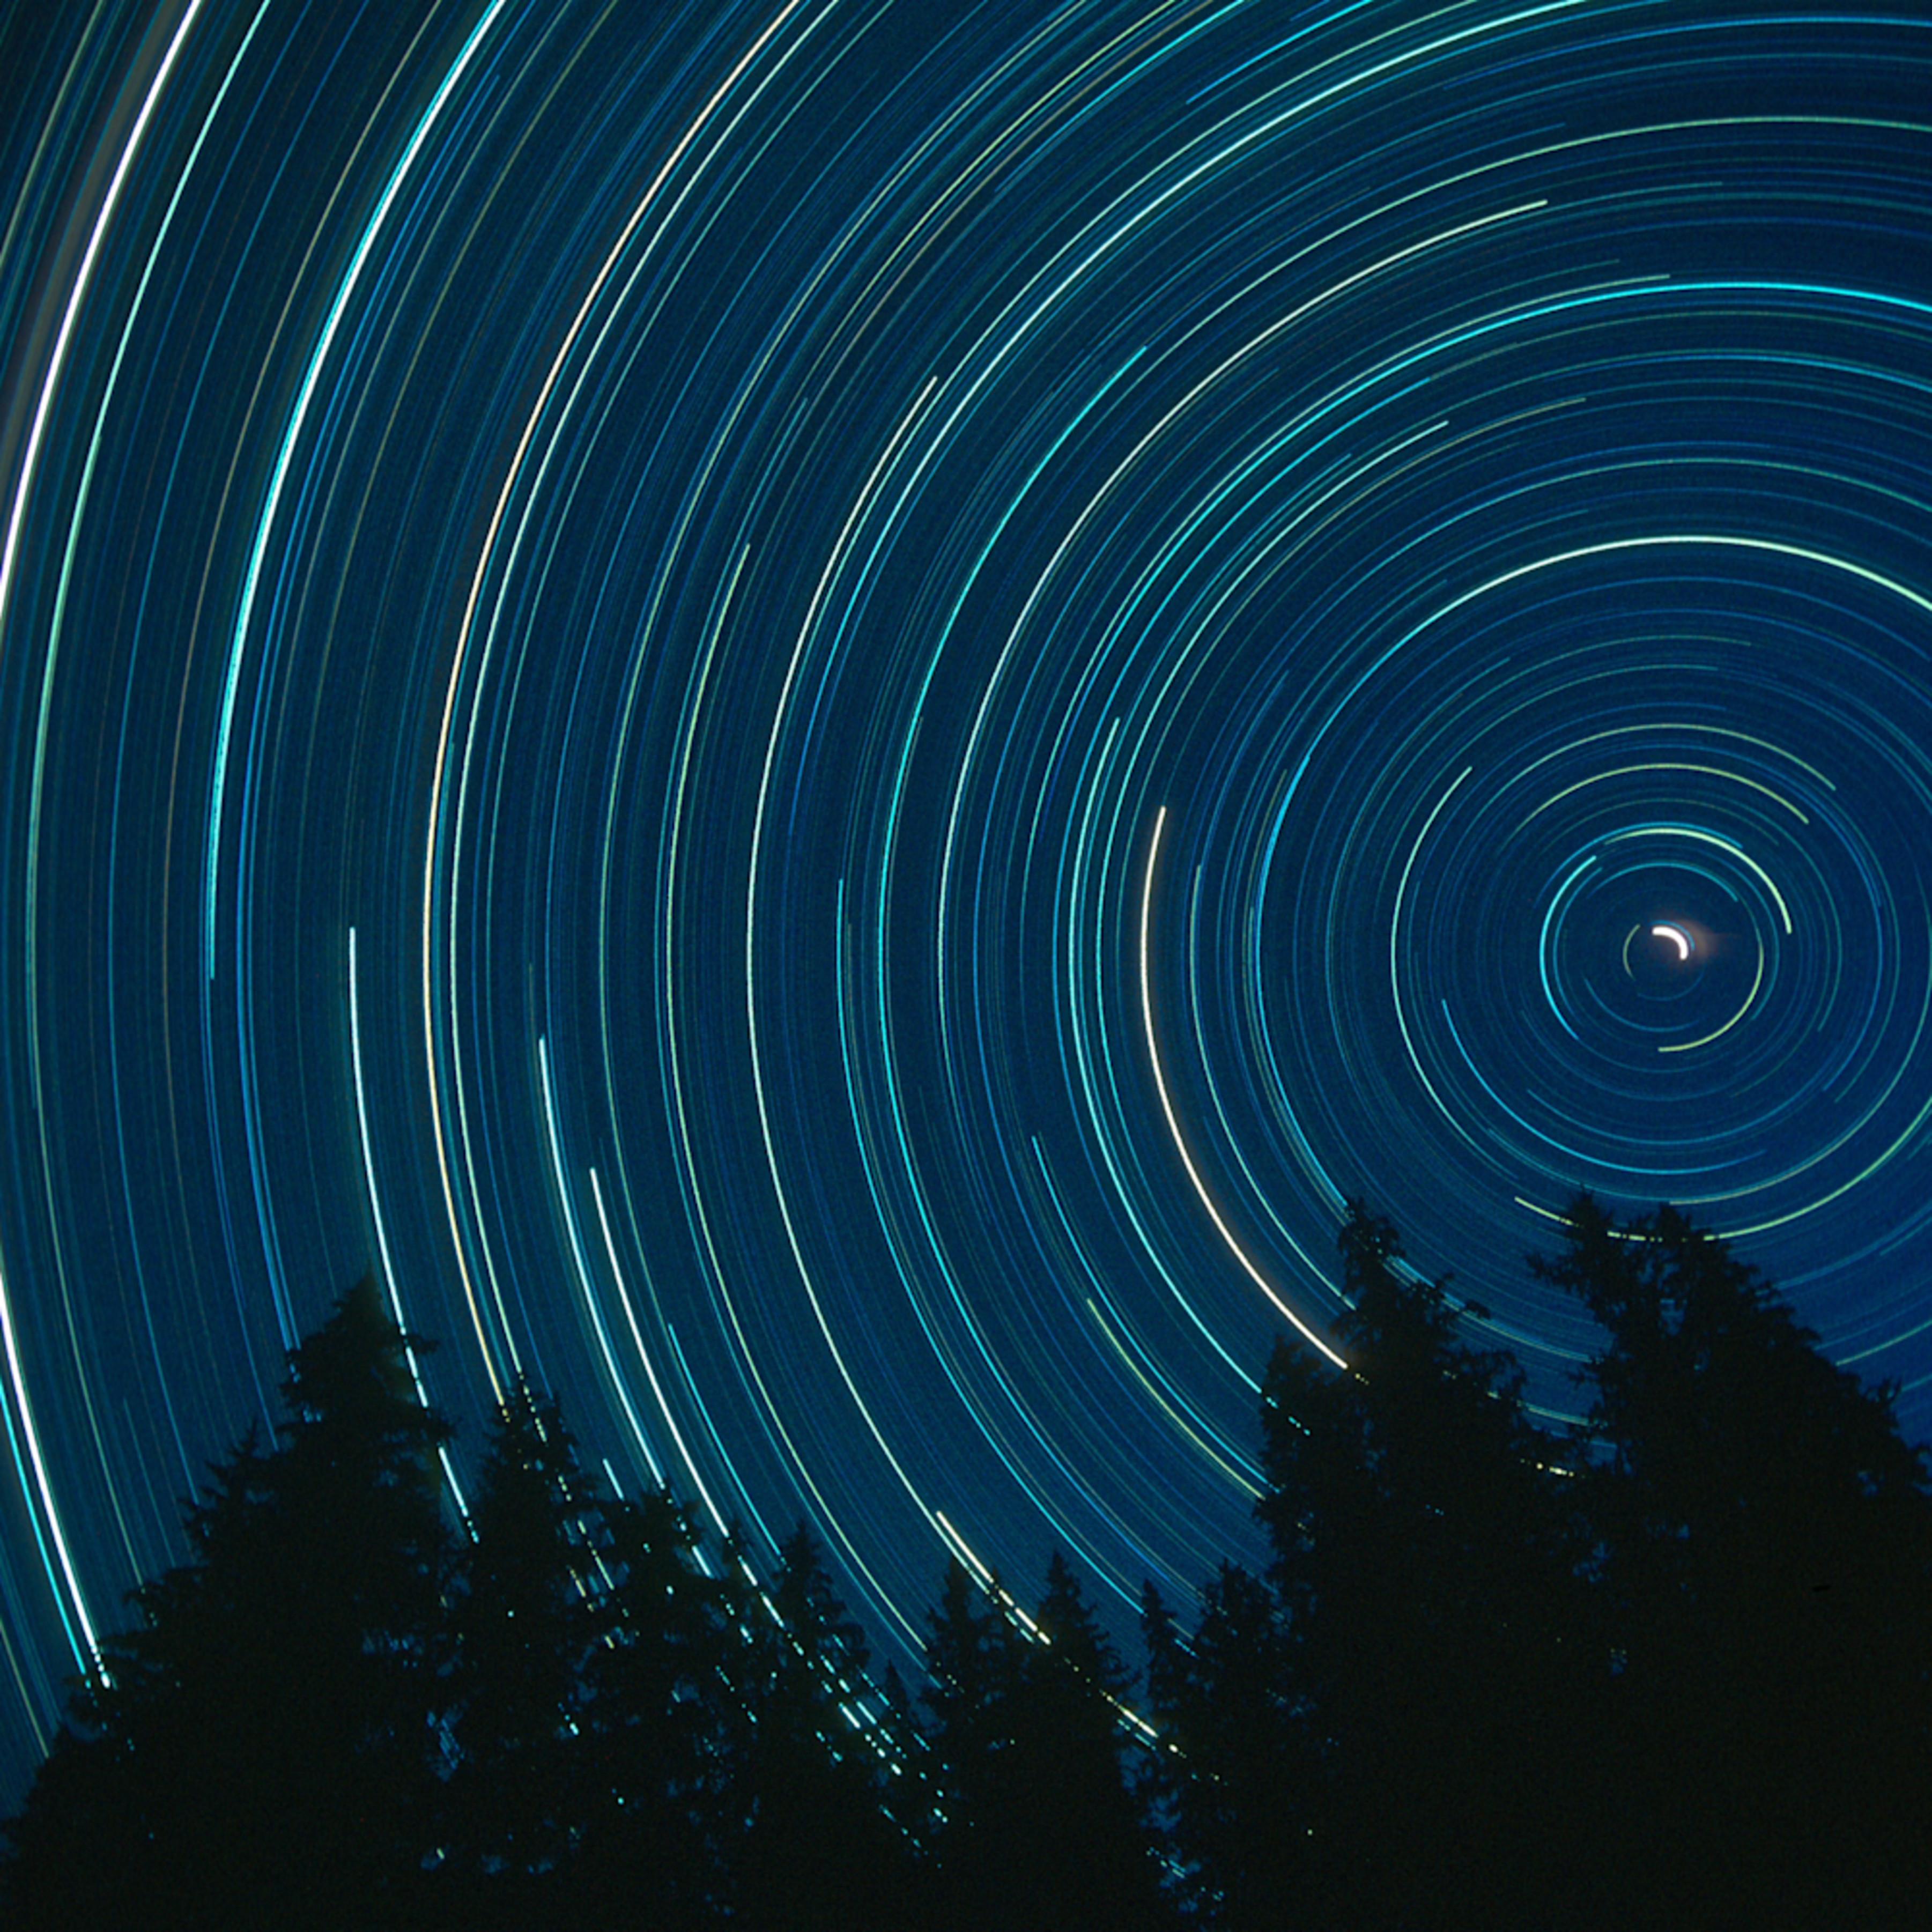 Star trails from mt. teewinot approach ridge mw0ctx